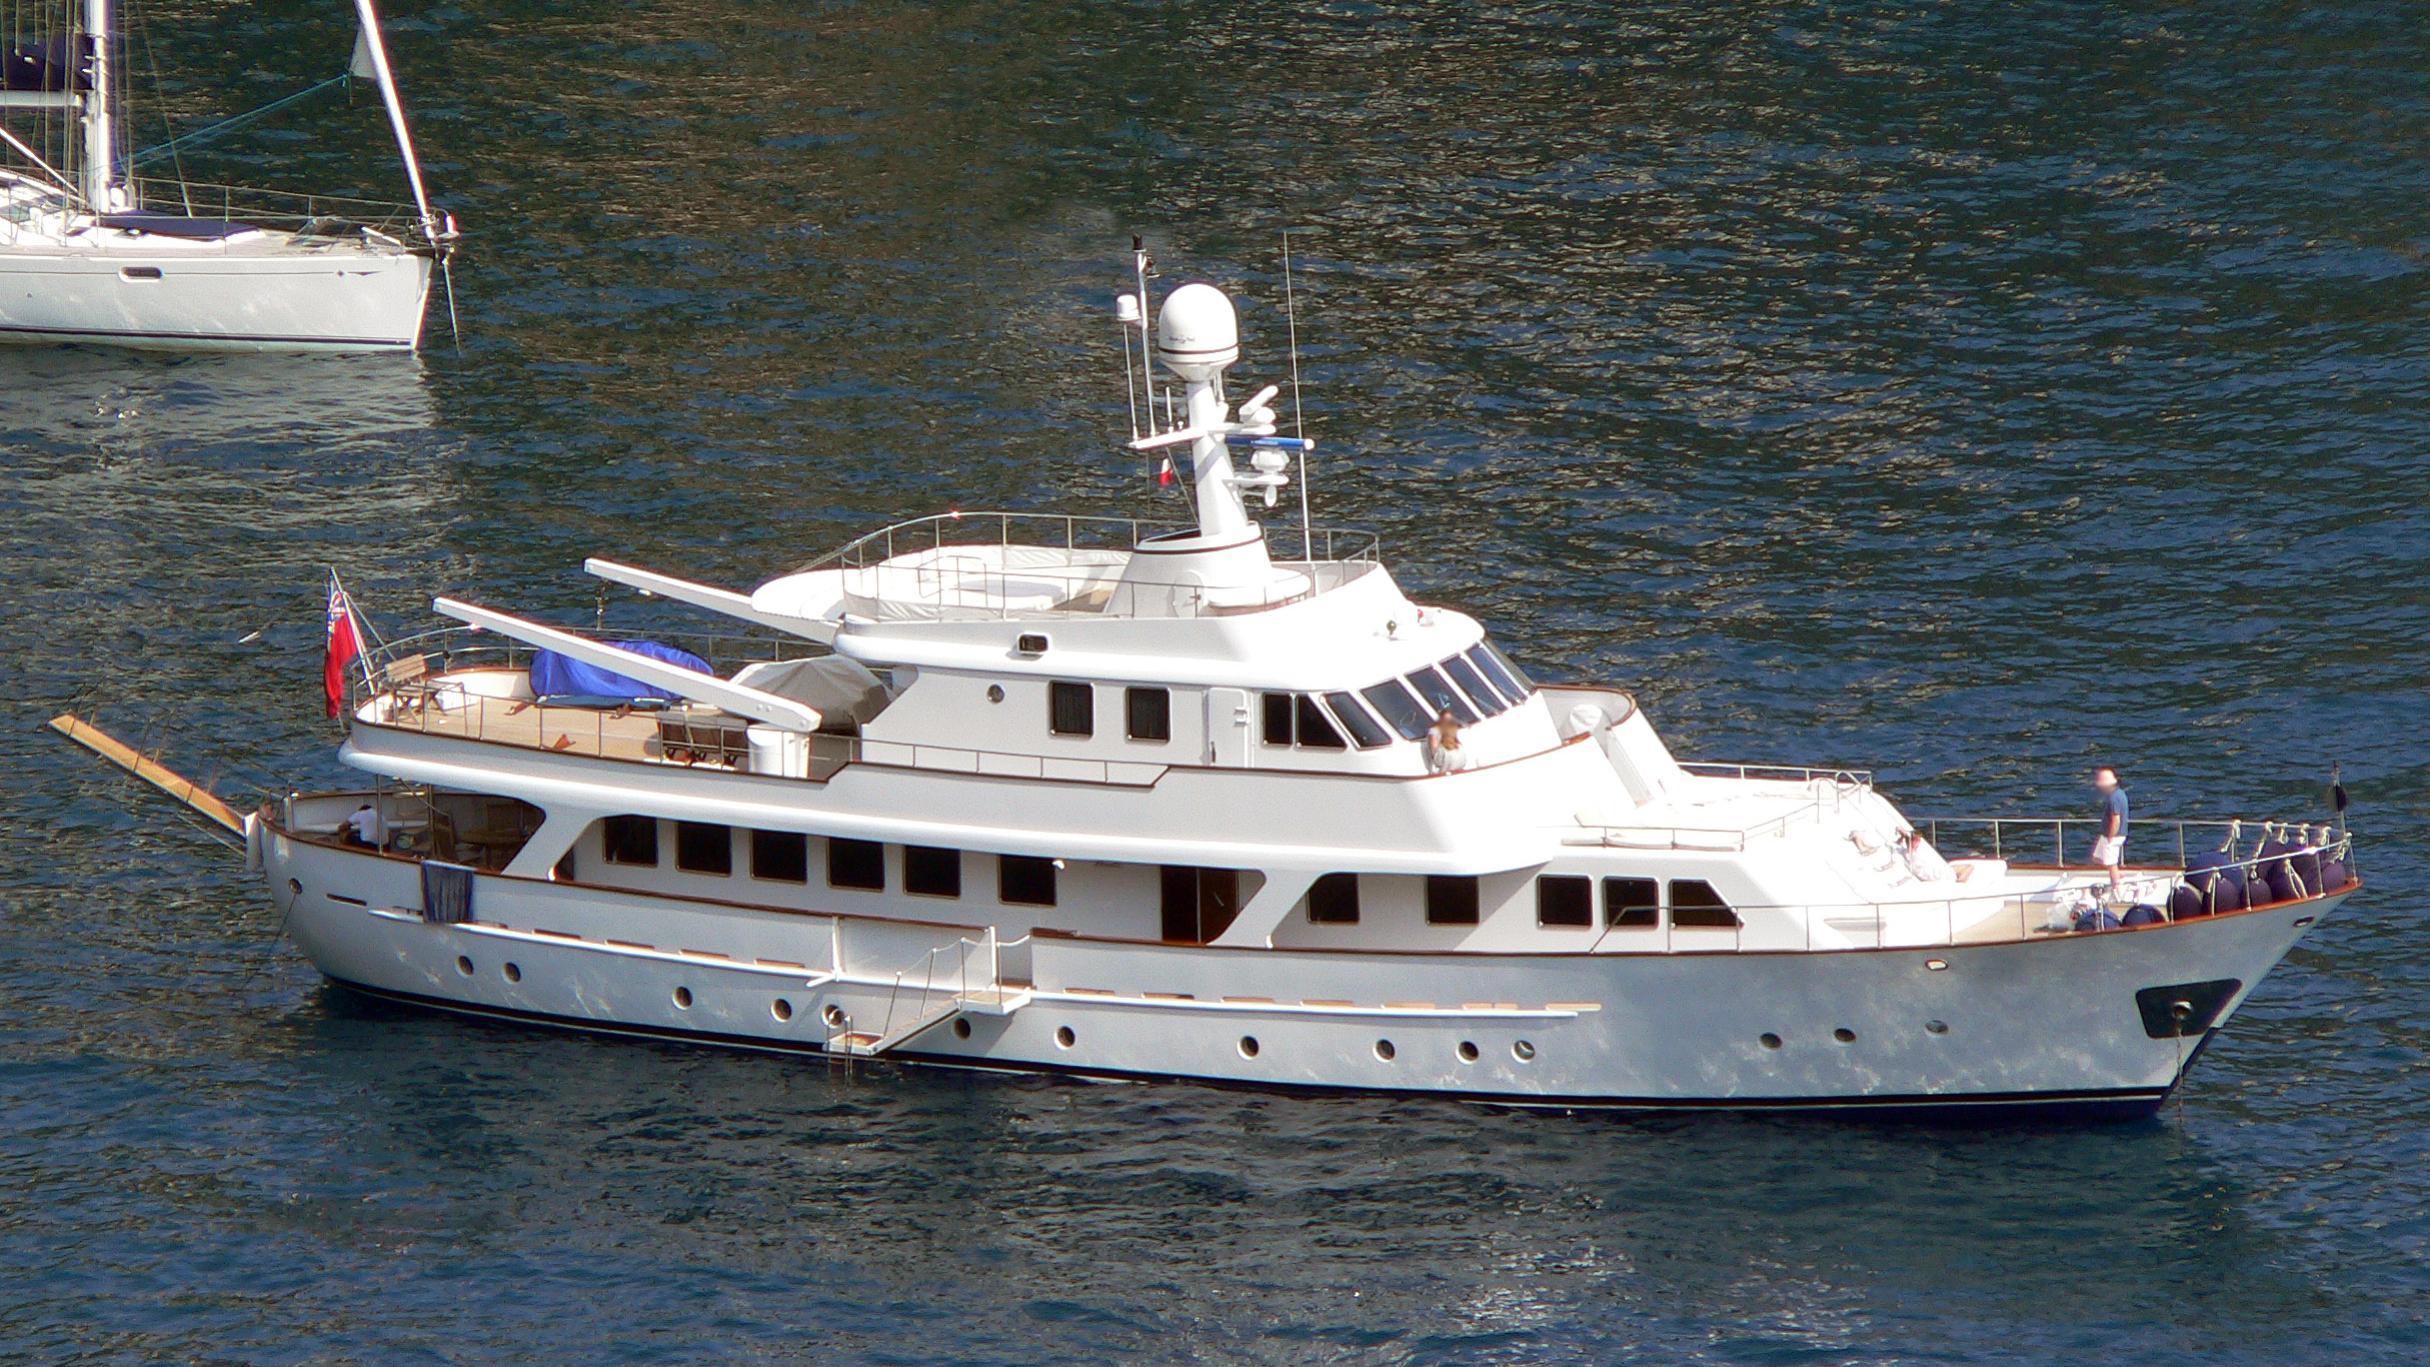 mizar-yacht-exterior